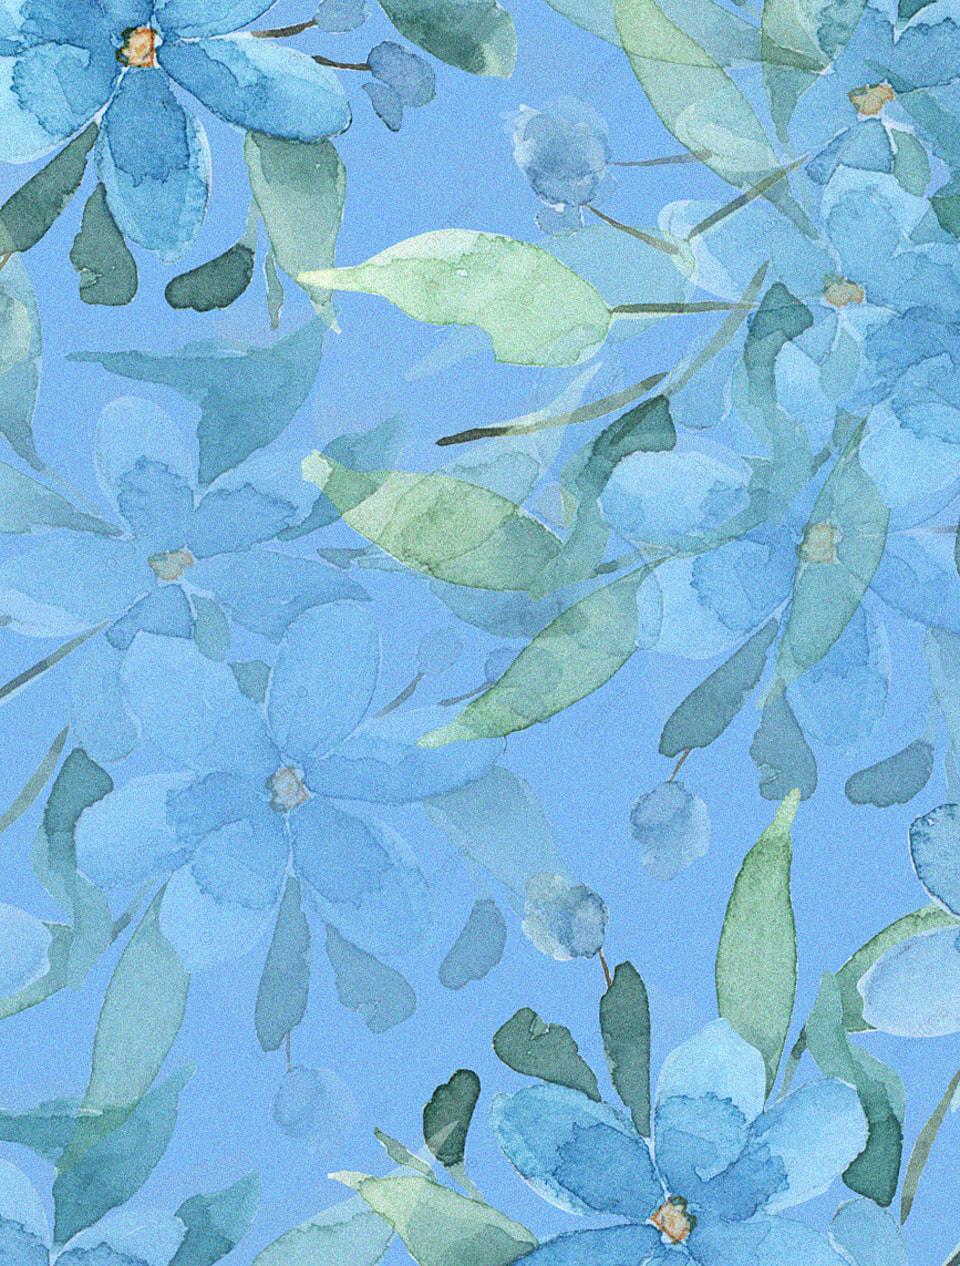 Asli Yang Dilukis Dengan Tangan Biru Perlindungan Lingkungan Atmosfer Latar Belakang Bunga Yang Indah Pengurangan Pajak Perlindungan Lingkungan Seni Gambar Latar Belakang Untuk Unduhan Gratis